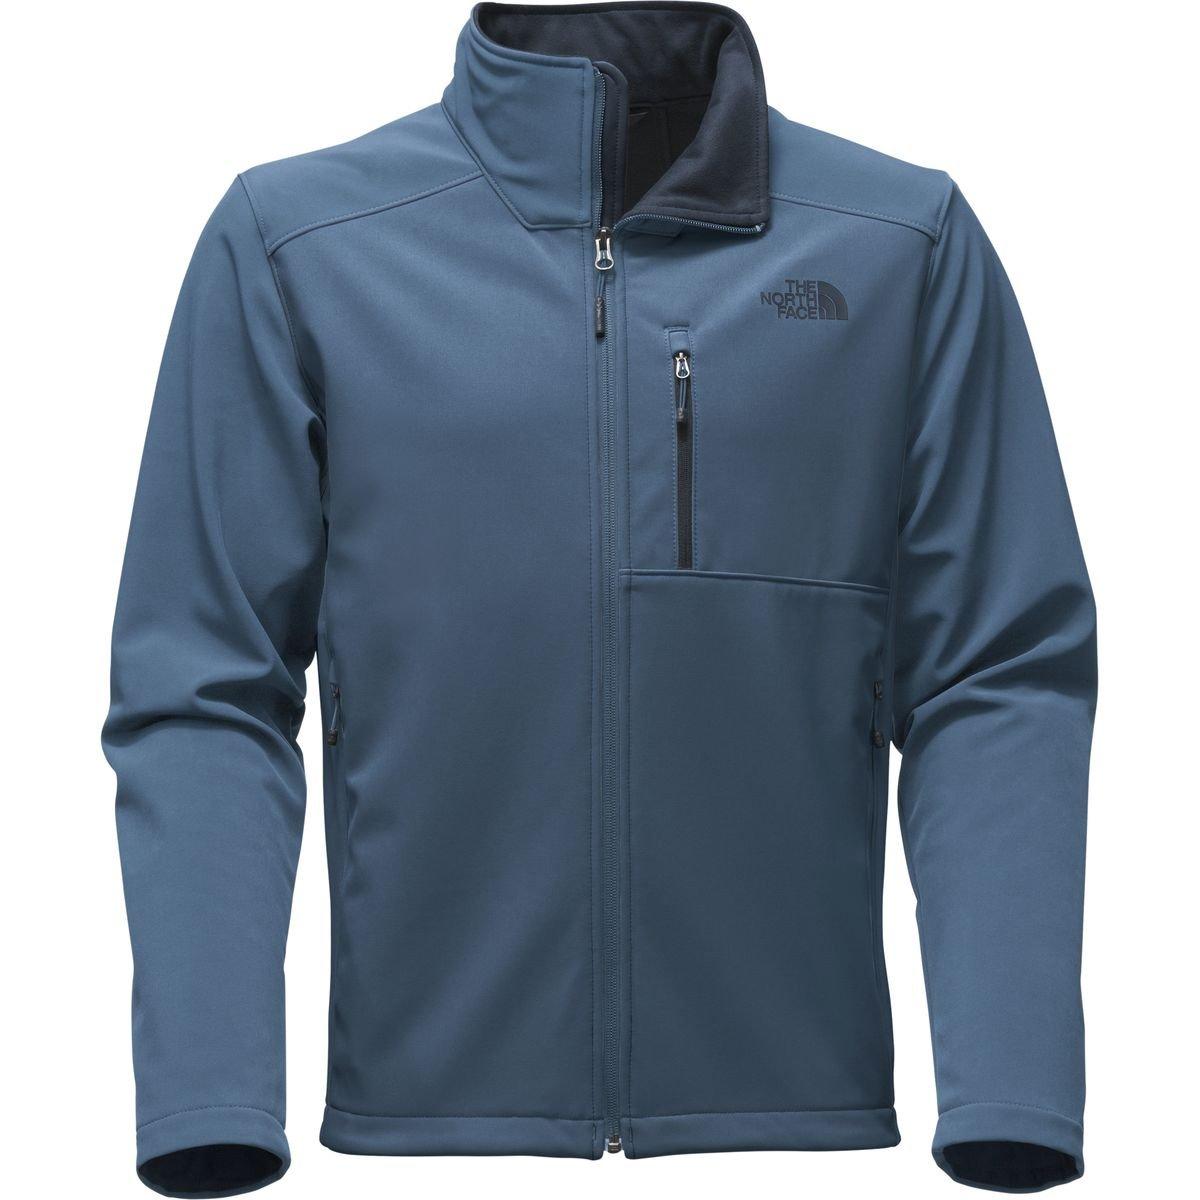 The North Face Apex Bionic Soft Shell Jacket – Men 's B01N57OPNN XXX-Large Shady Blue/Shady Blue Shady Blue/Shady Blue XXX-Large